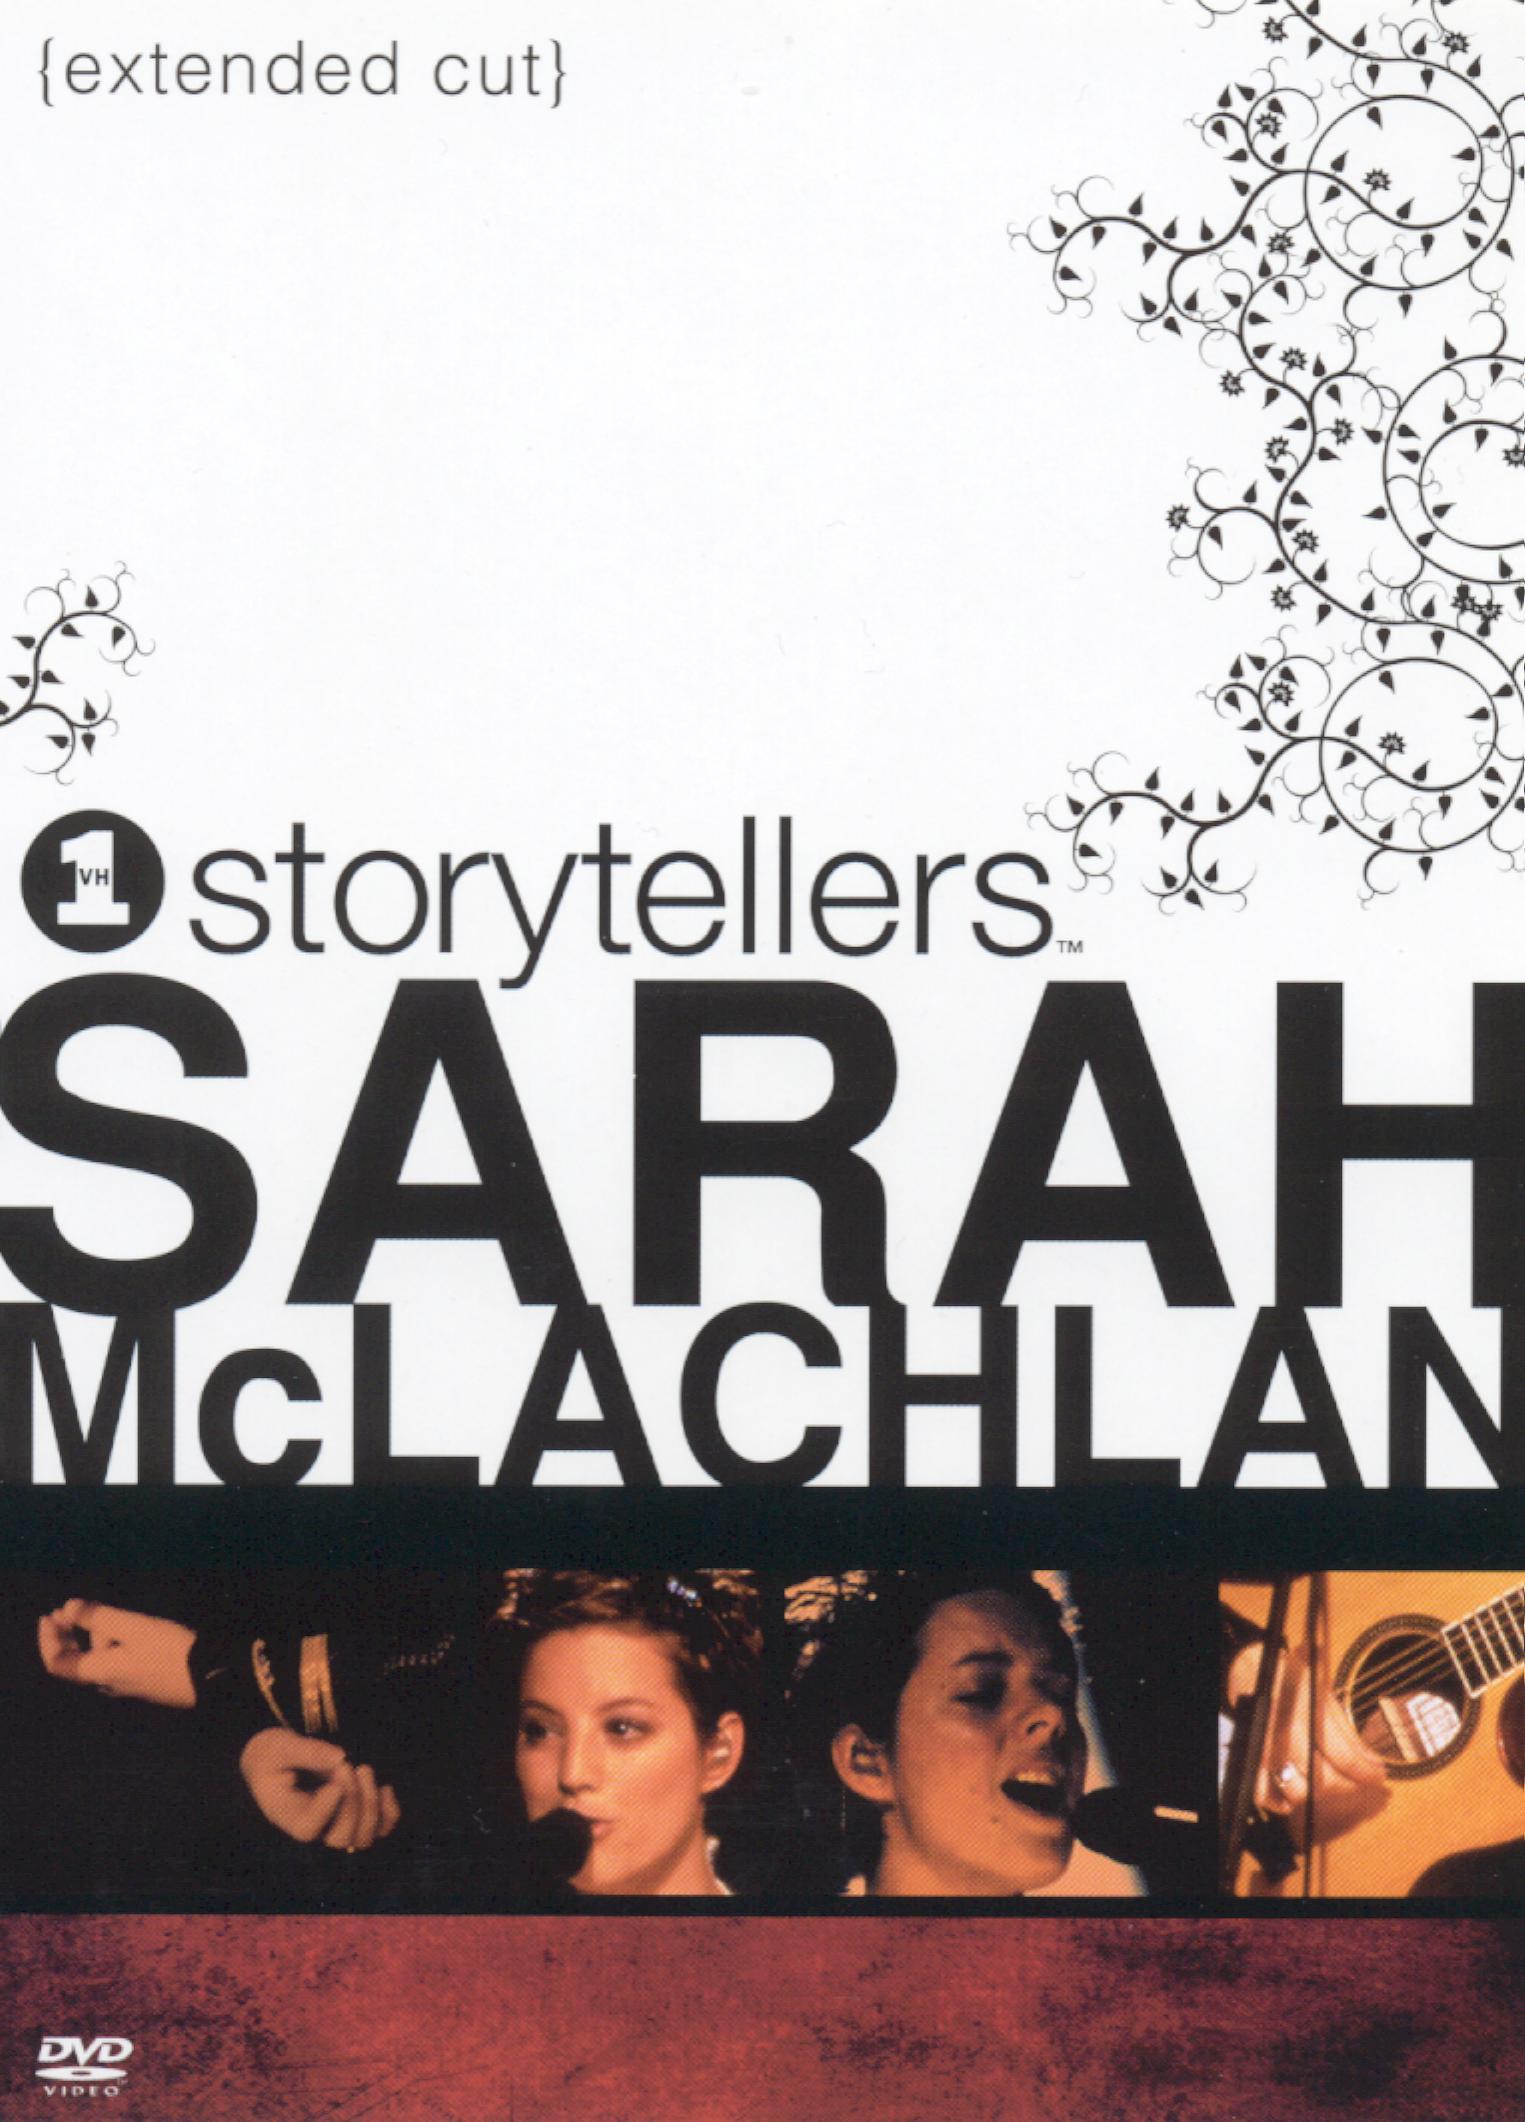 VH1 Storytellers: Sarah McLachlan